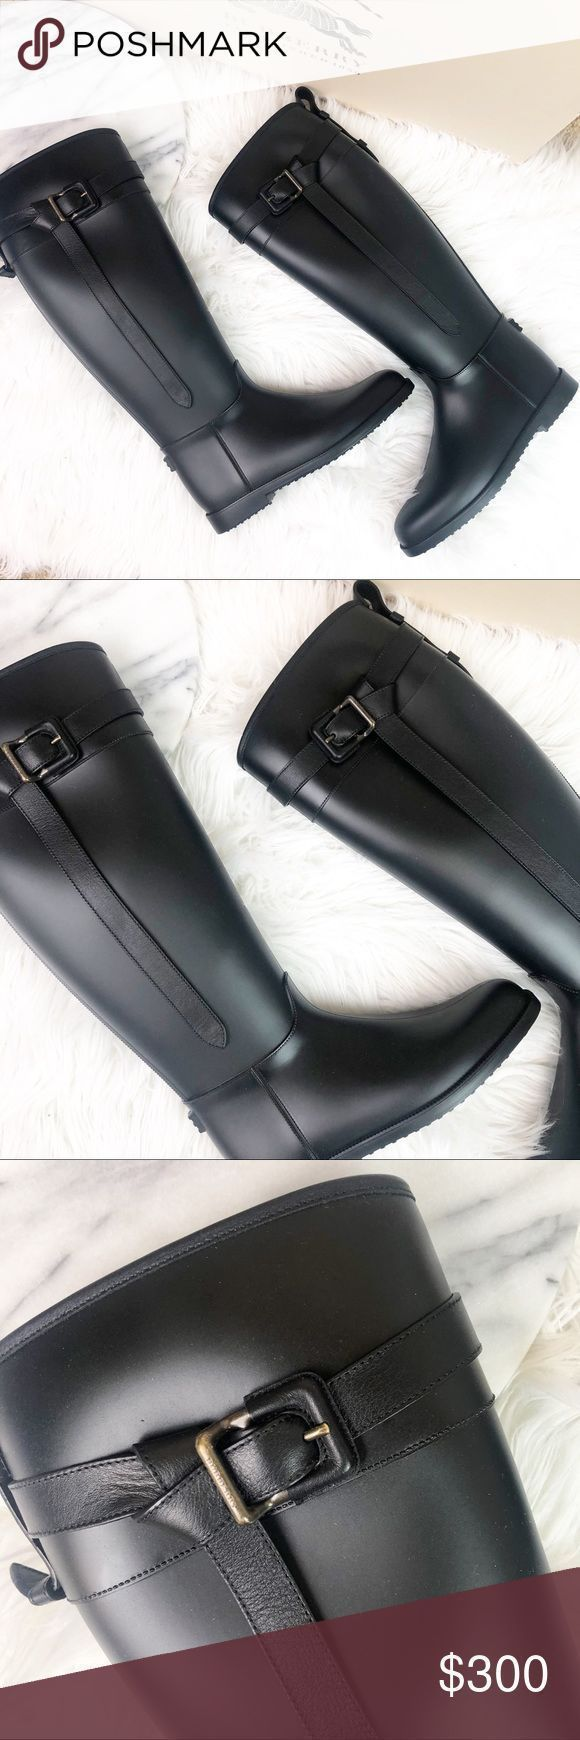 #AestheticButtockSurgical-Burberry Matte Rubber hohe Stiefel ⦁ Eigenschaften: …